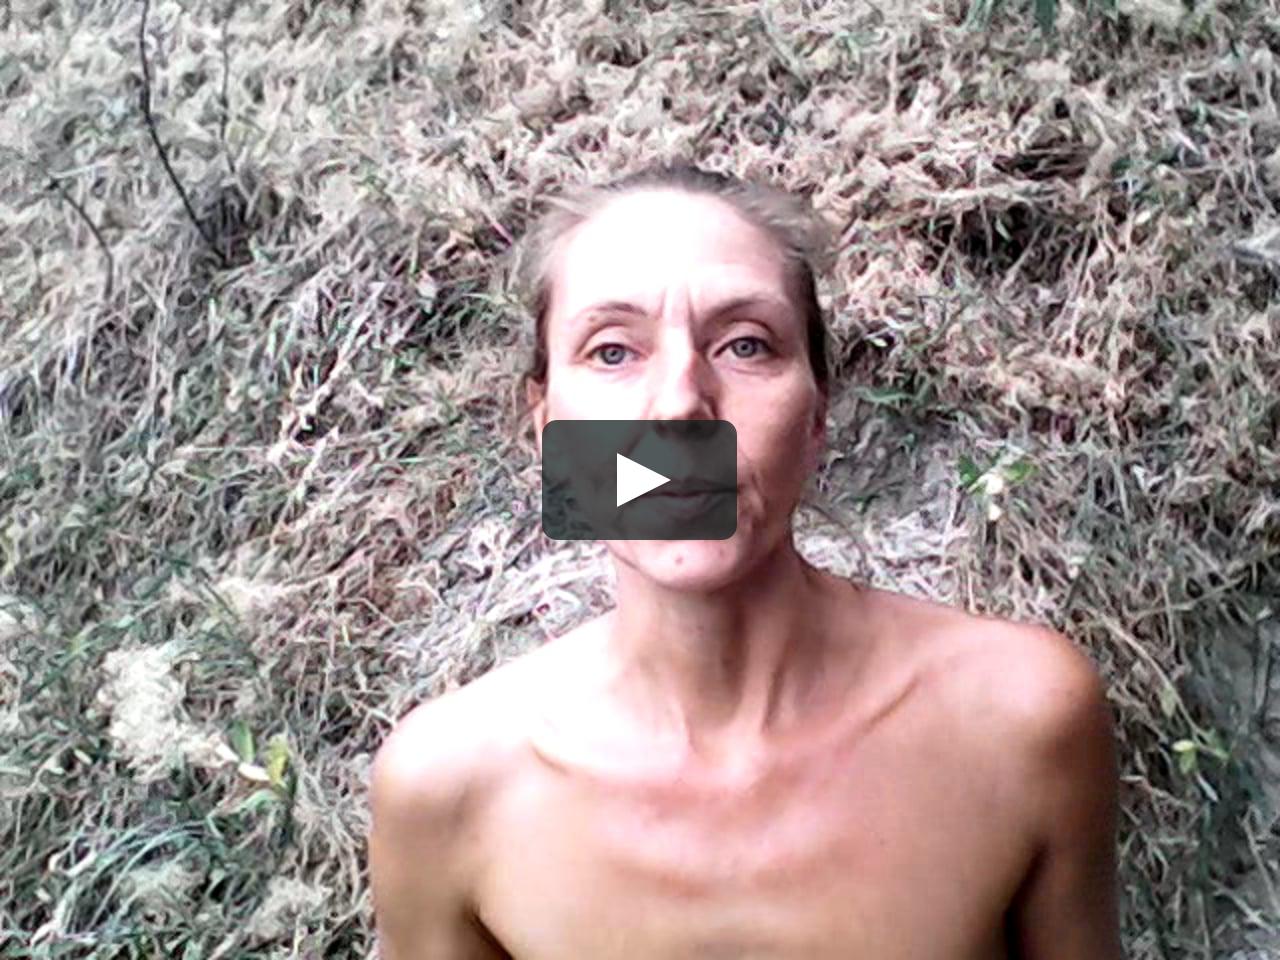 23rd Of August Naturist Report On Vimeo